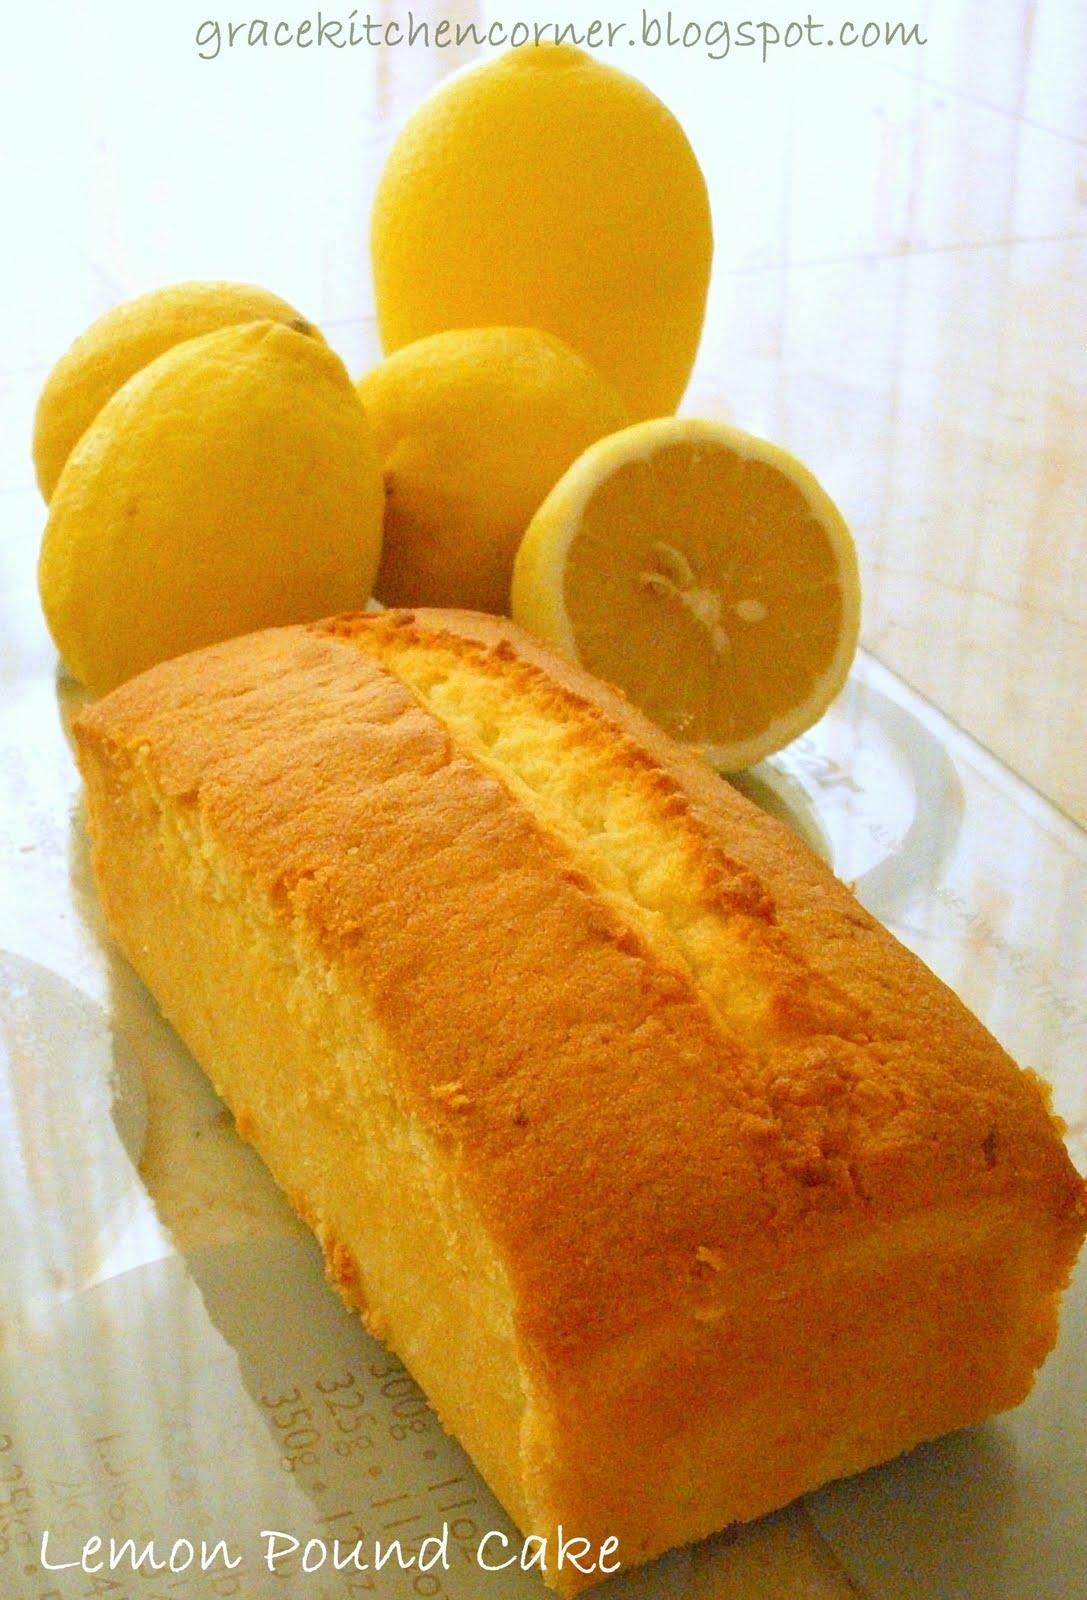 Kitchen corner lemon pound cake april 7 2010 forumfinder Choice Image